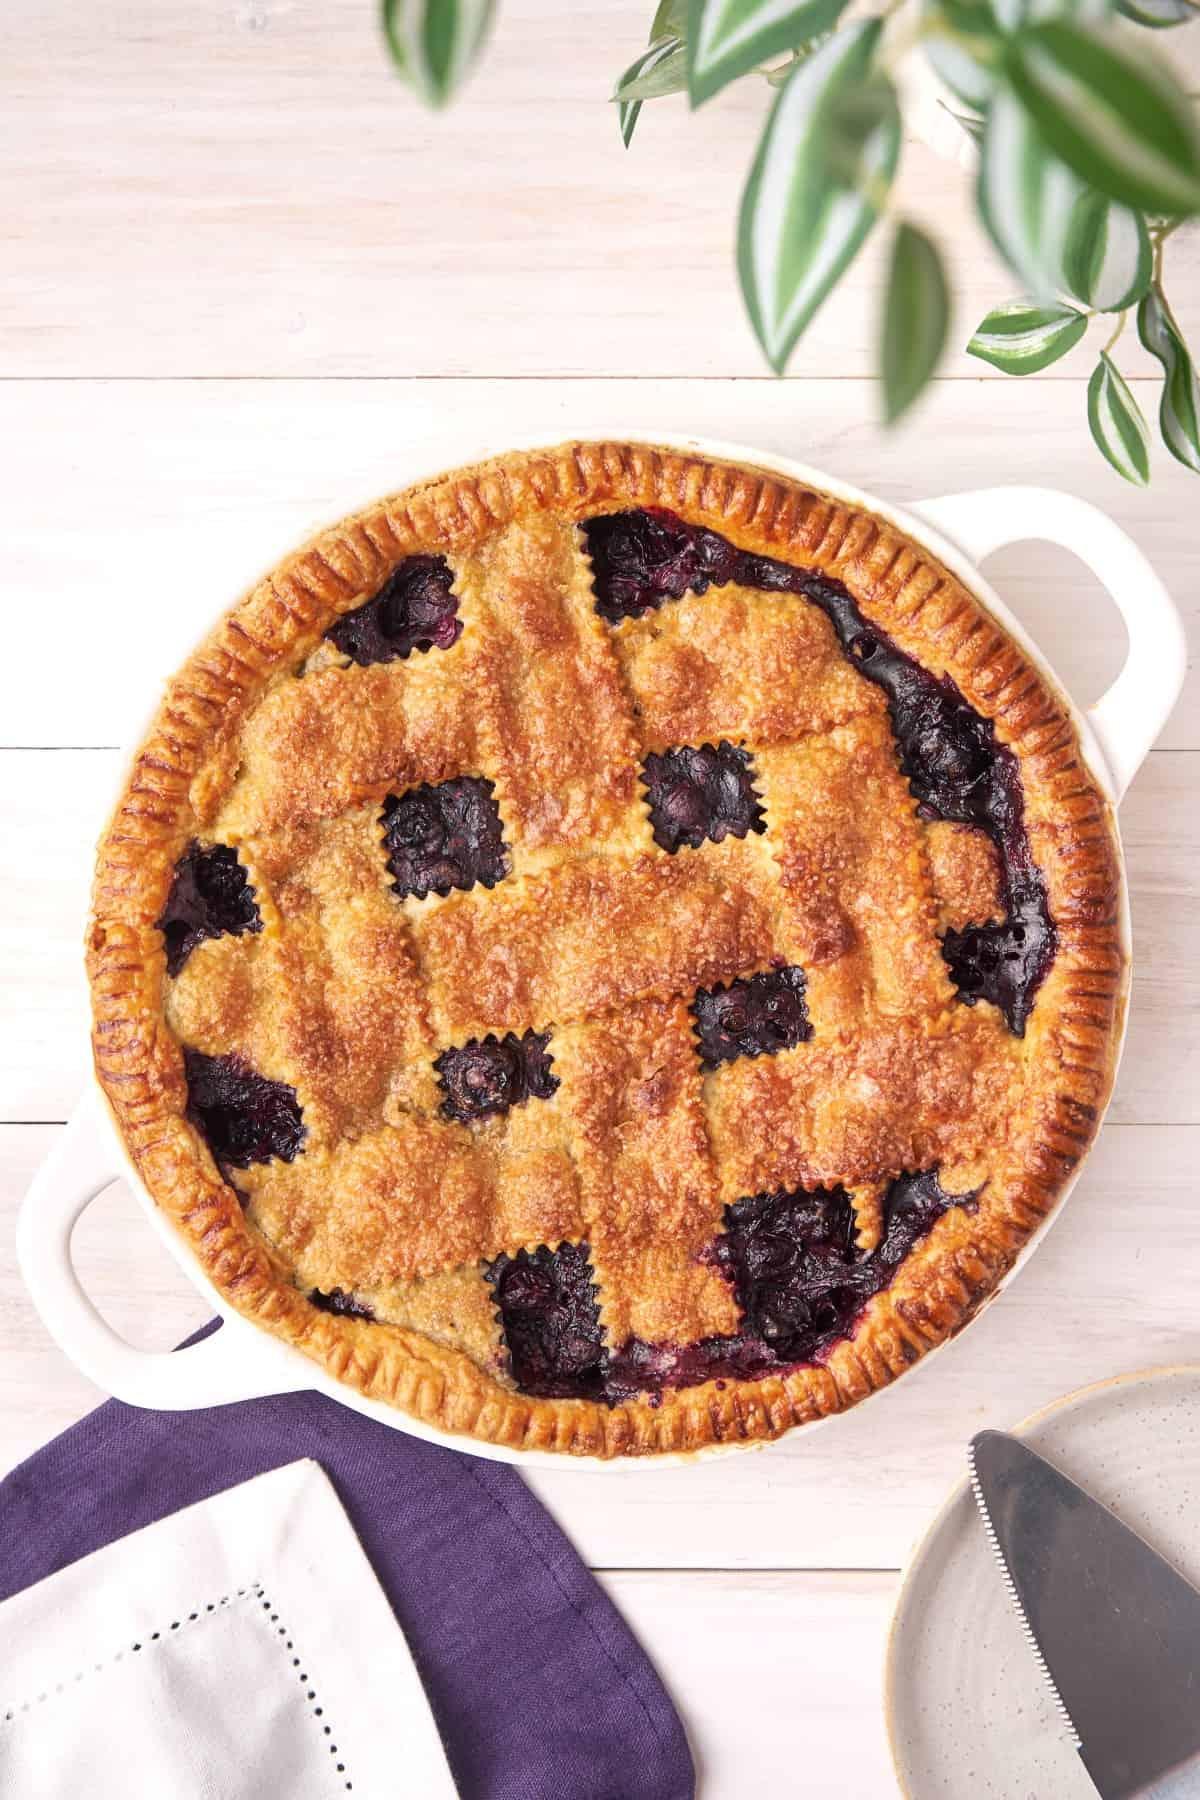 Overhead shot of blueberry pie